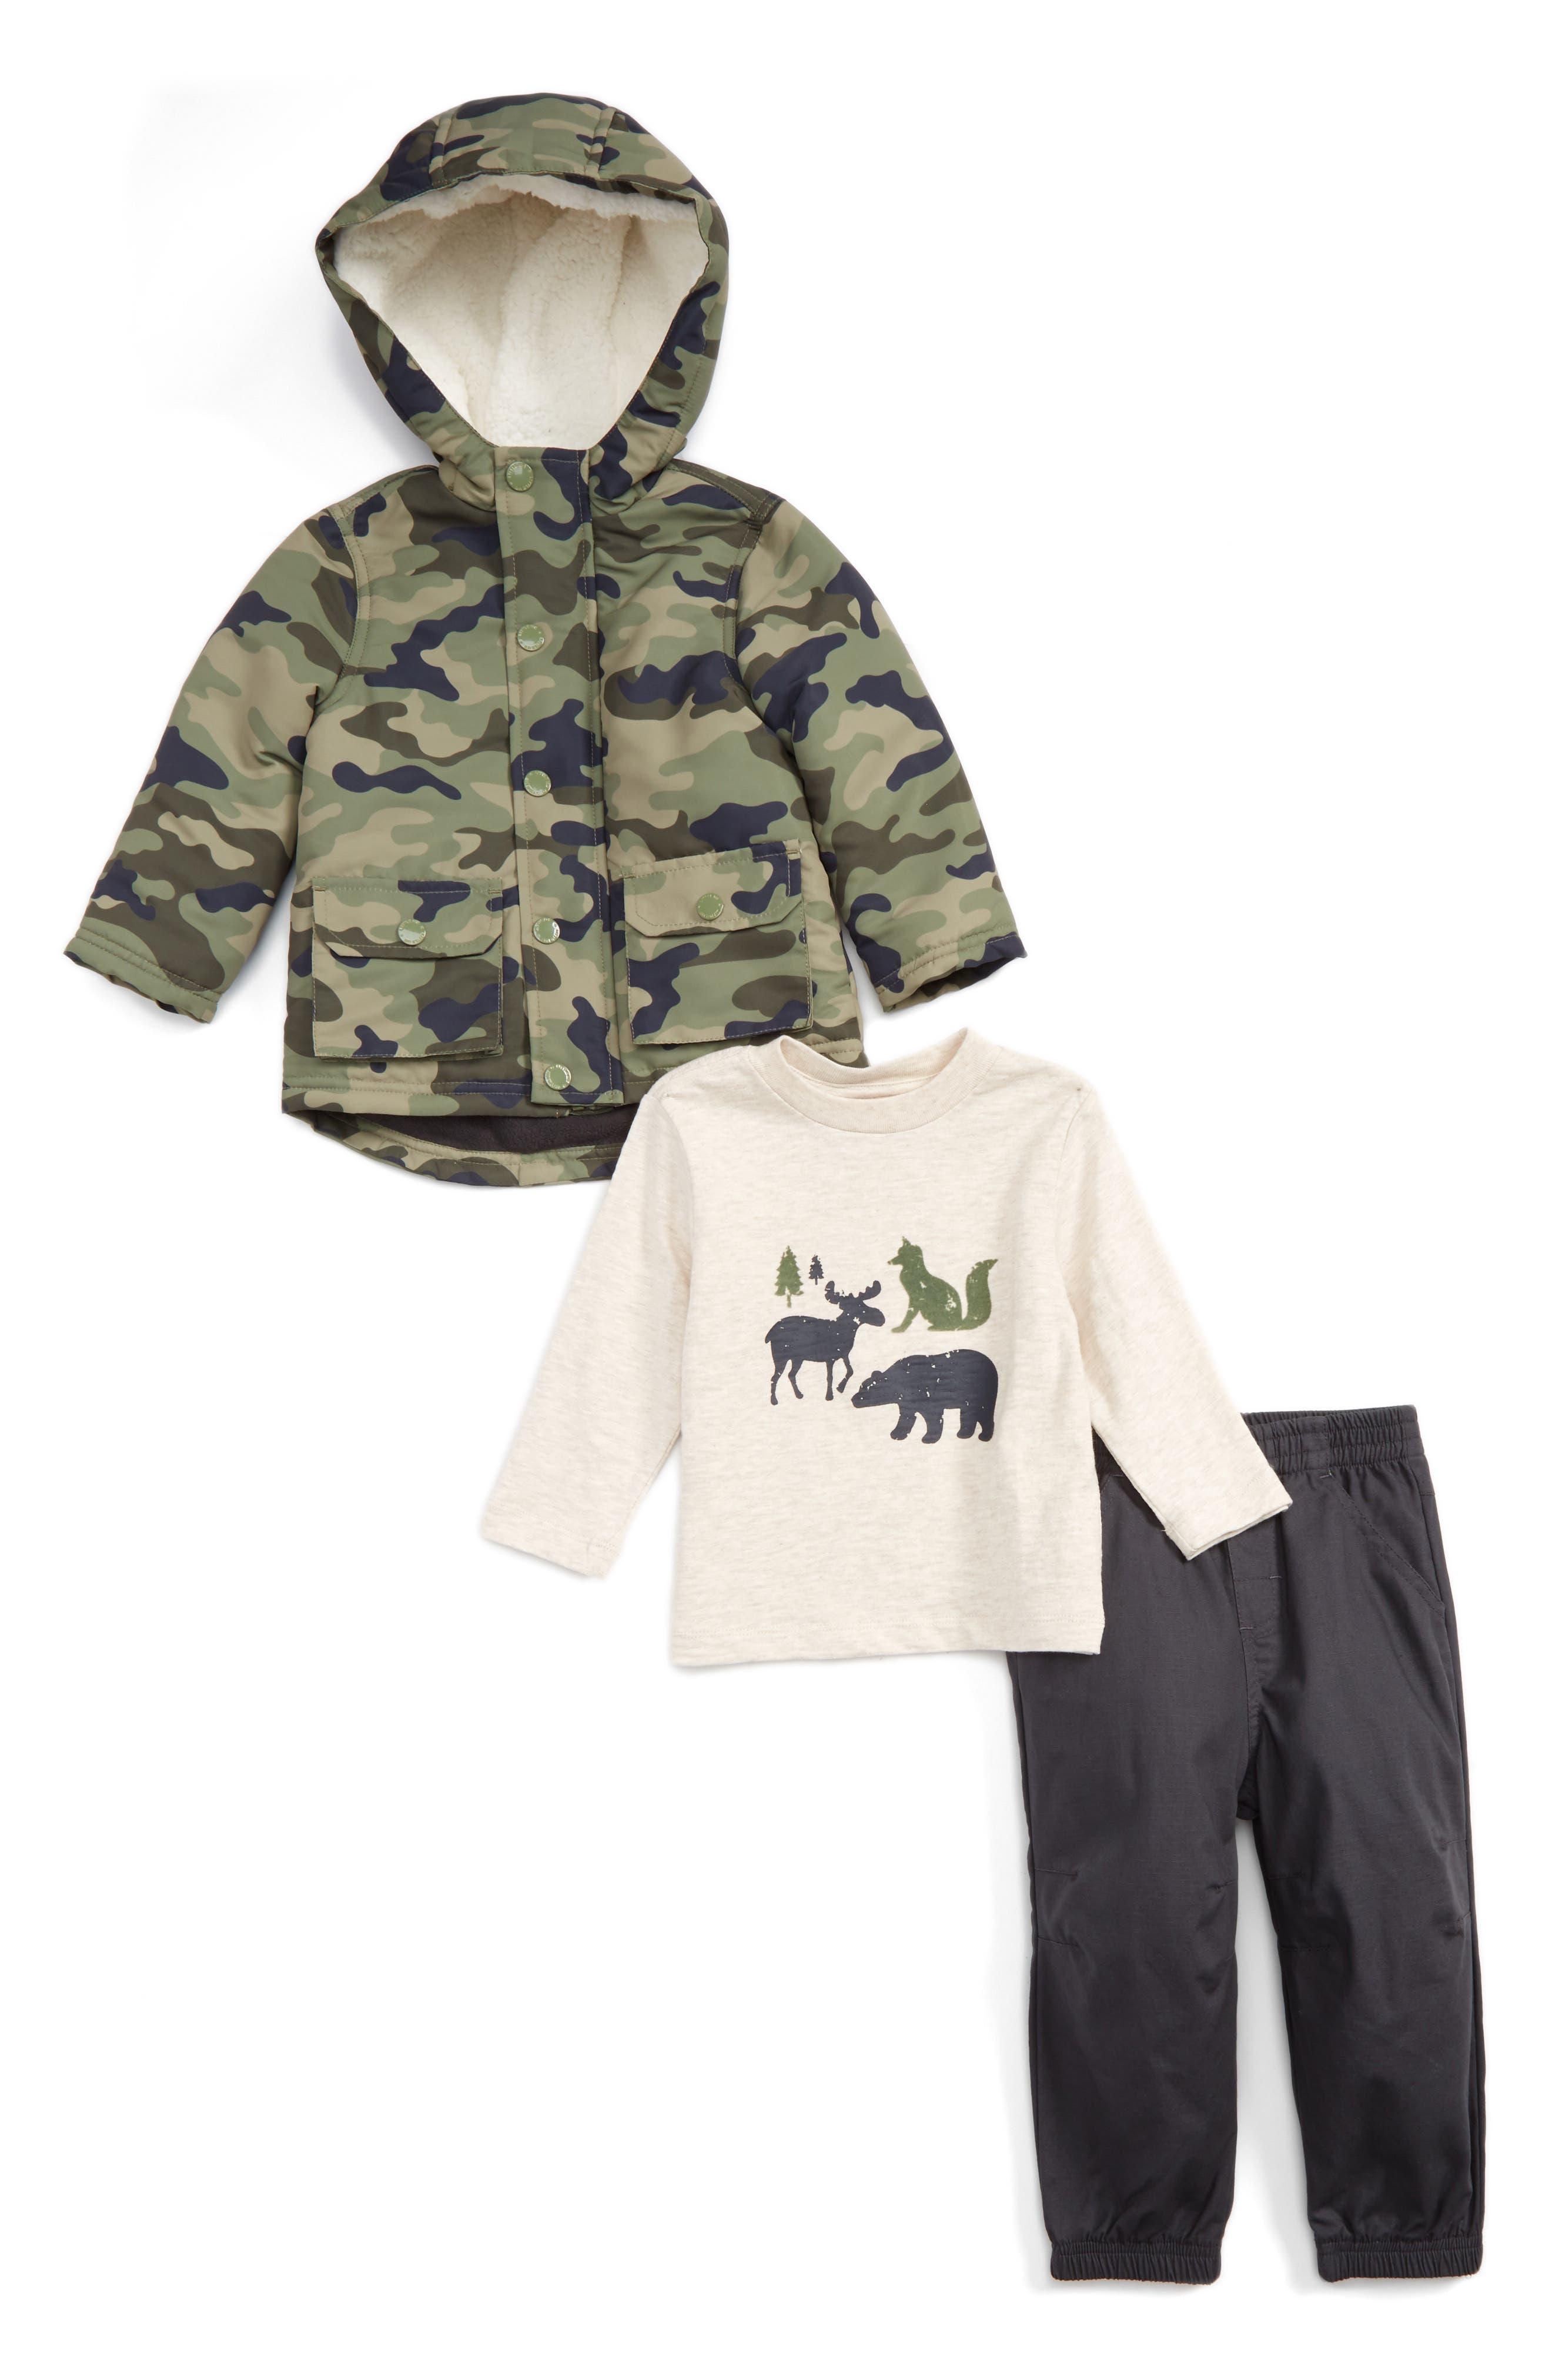 Main Image - Little Me Camo Hooded Jacket, T-Shirt & Pants Set (Baby Boys)